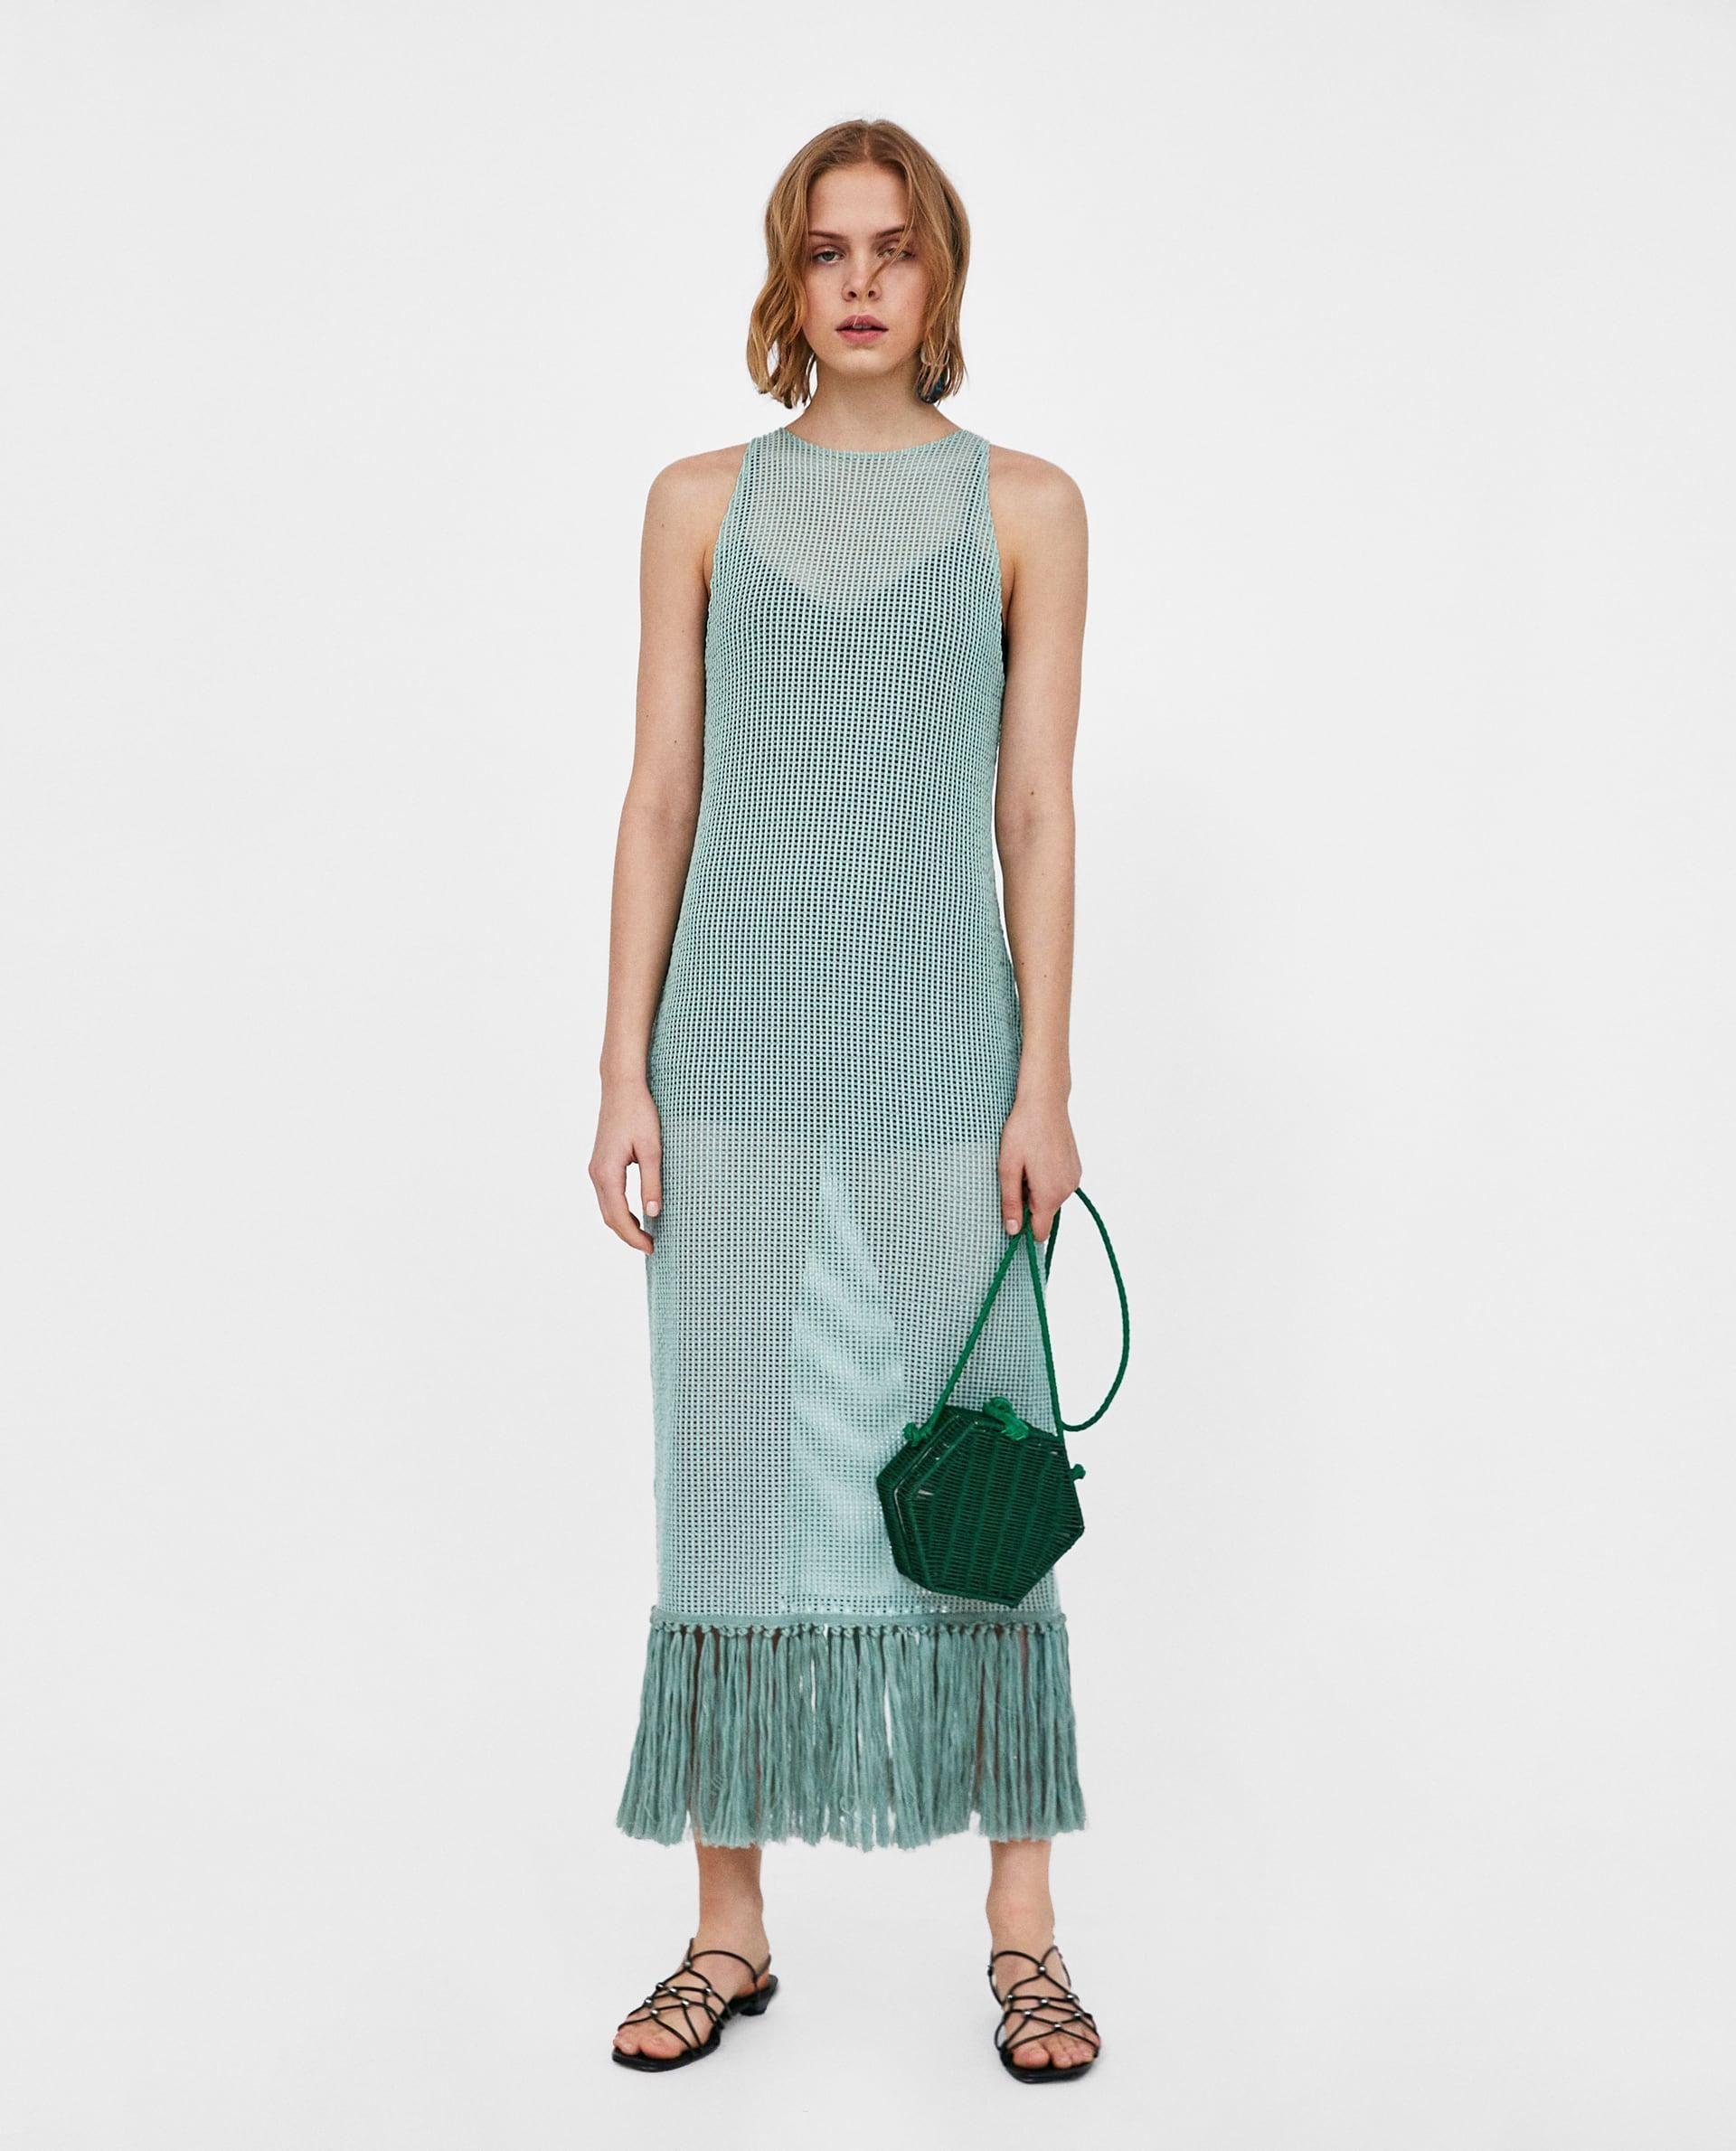 4baeff44 Mesh Dress With Fringing // 45.90 USD // Zara // Long sleeveless dress with  round neckline and matching fringing along the hem. HEIGHT OF MODEL: 178 CM  / 5′ ...